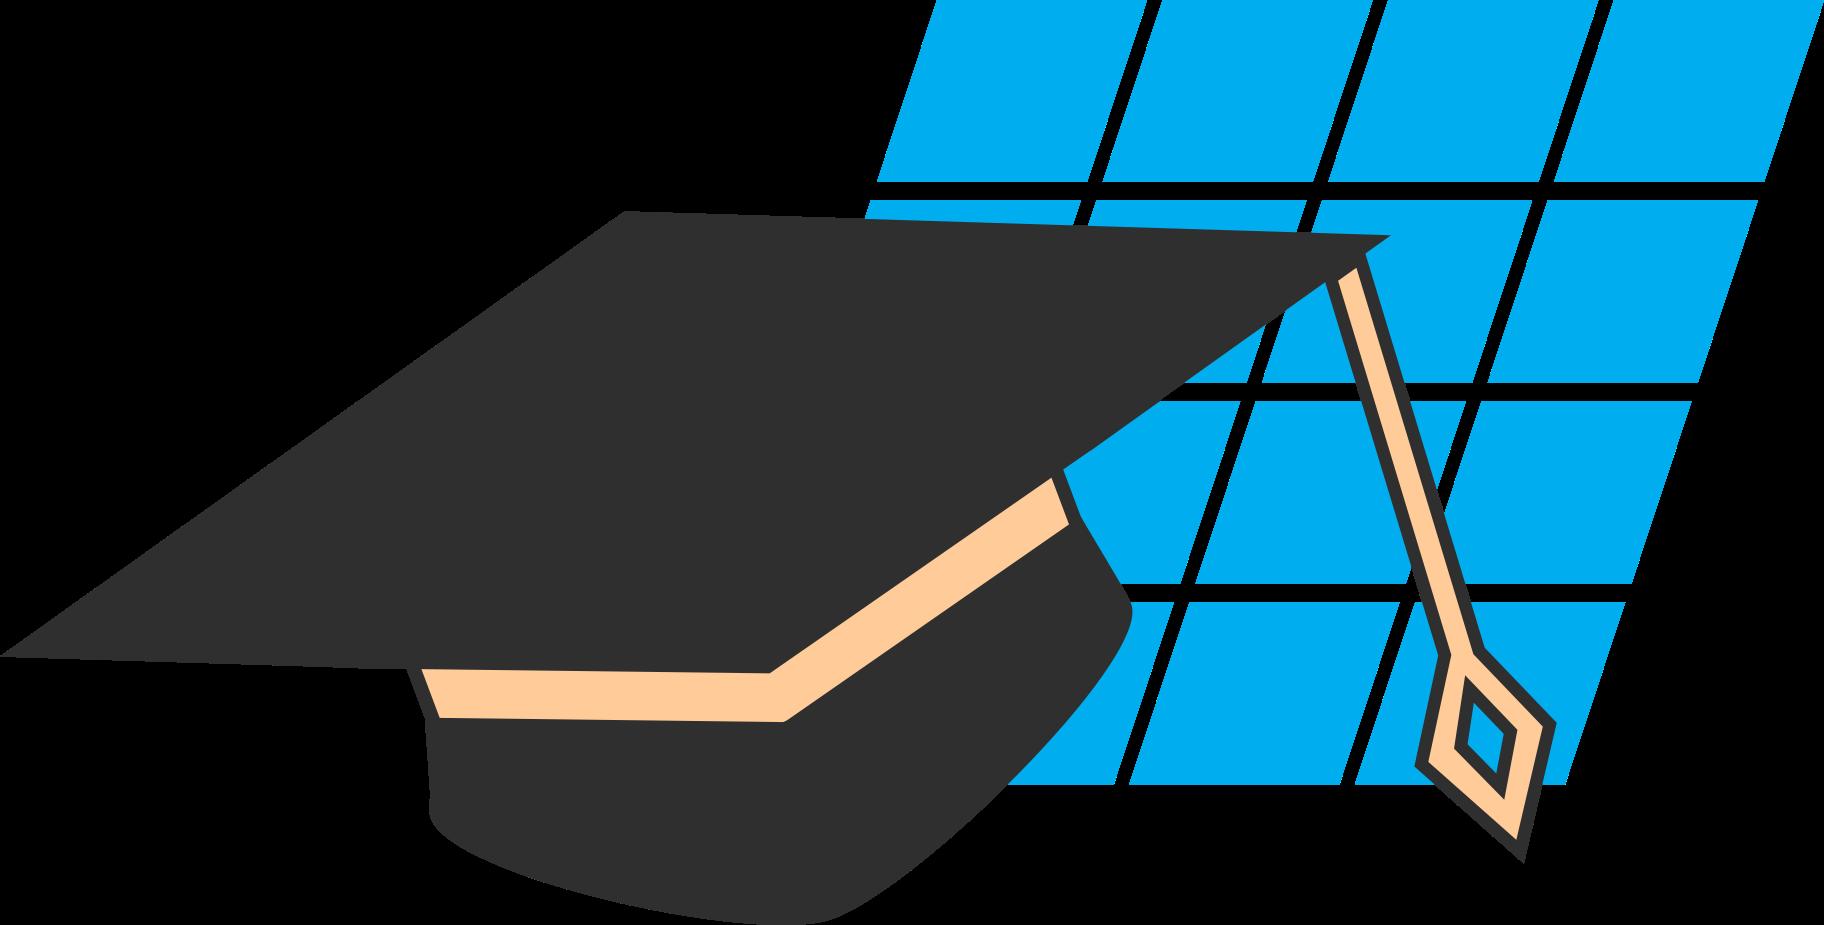 Panel Data icon